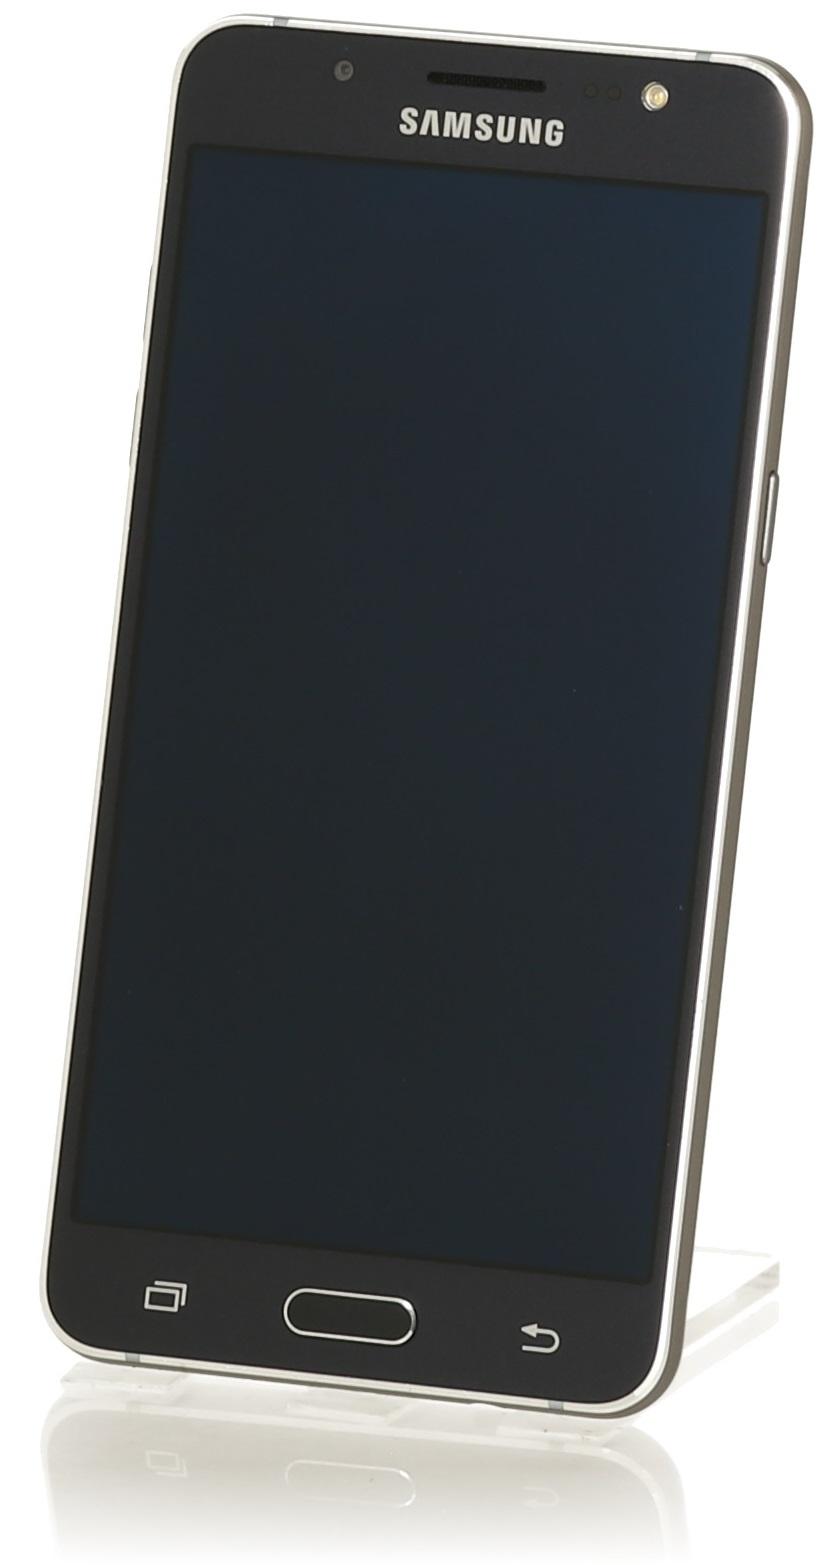 Samsung J510F Galaxy J5 (2016) DUOS 16GB black